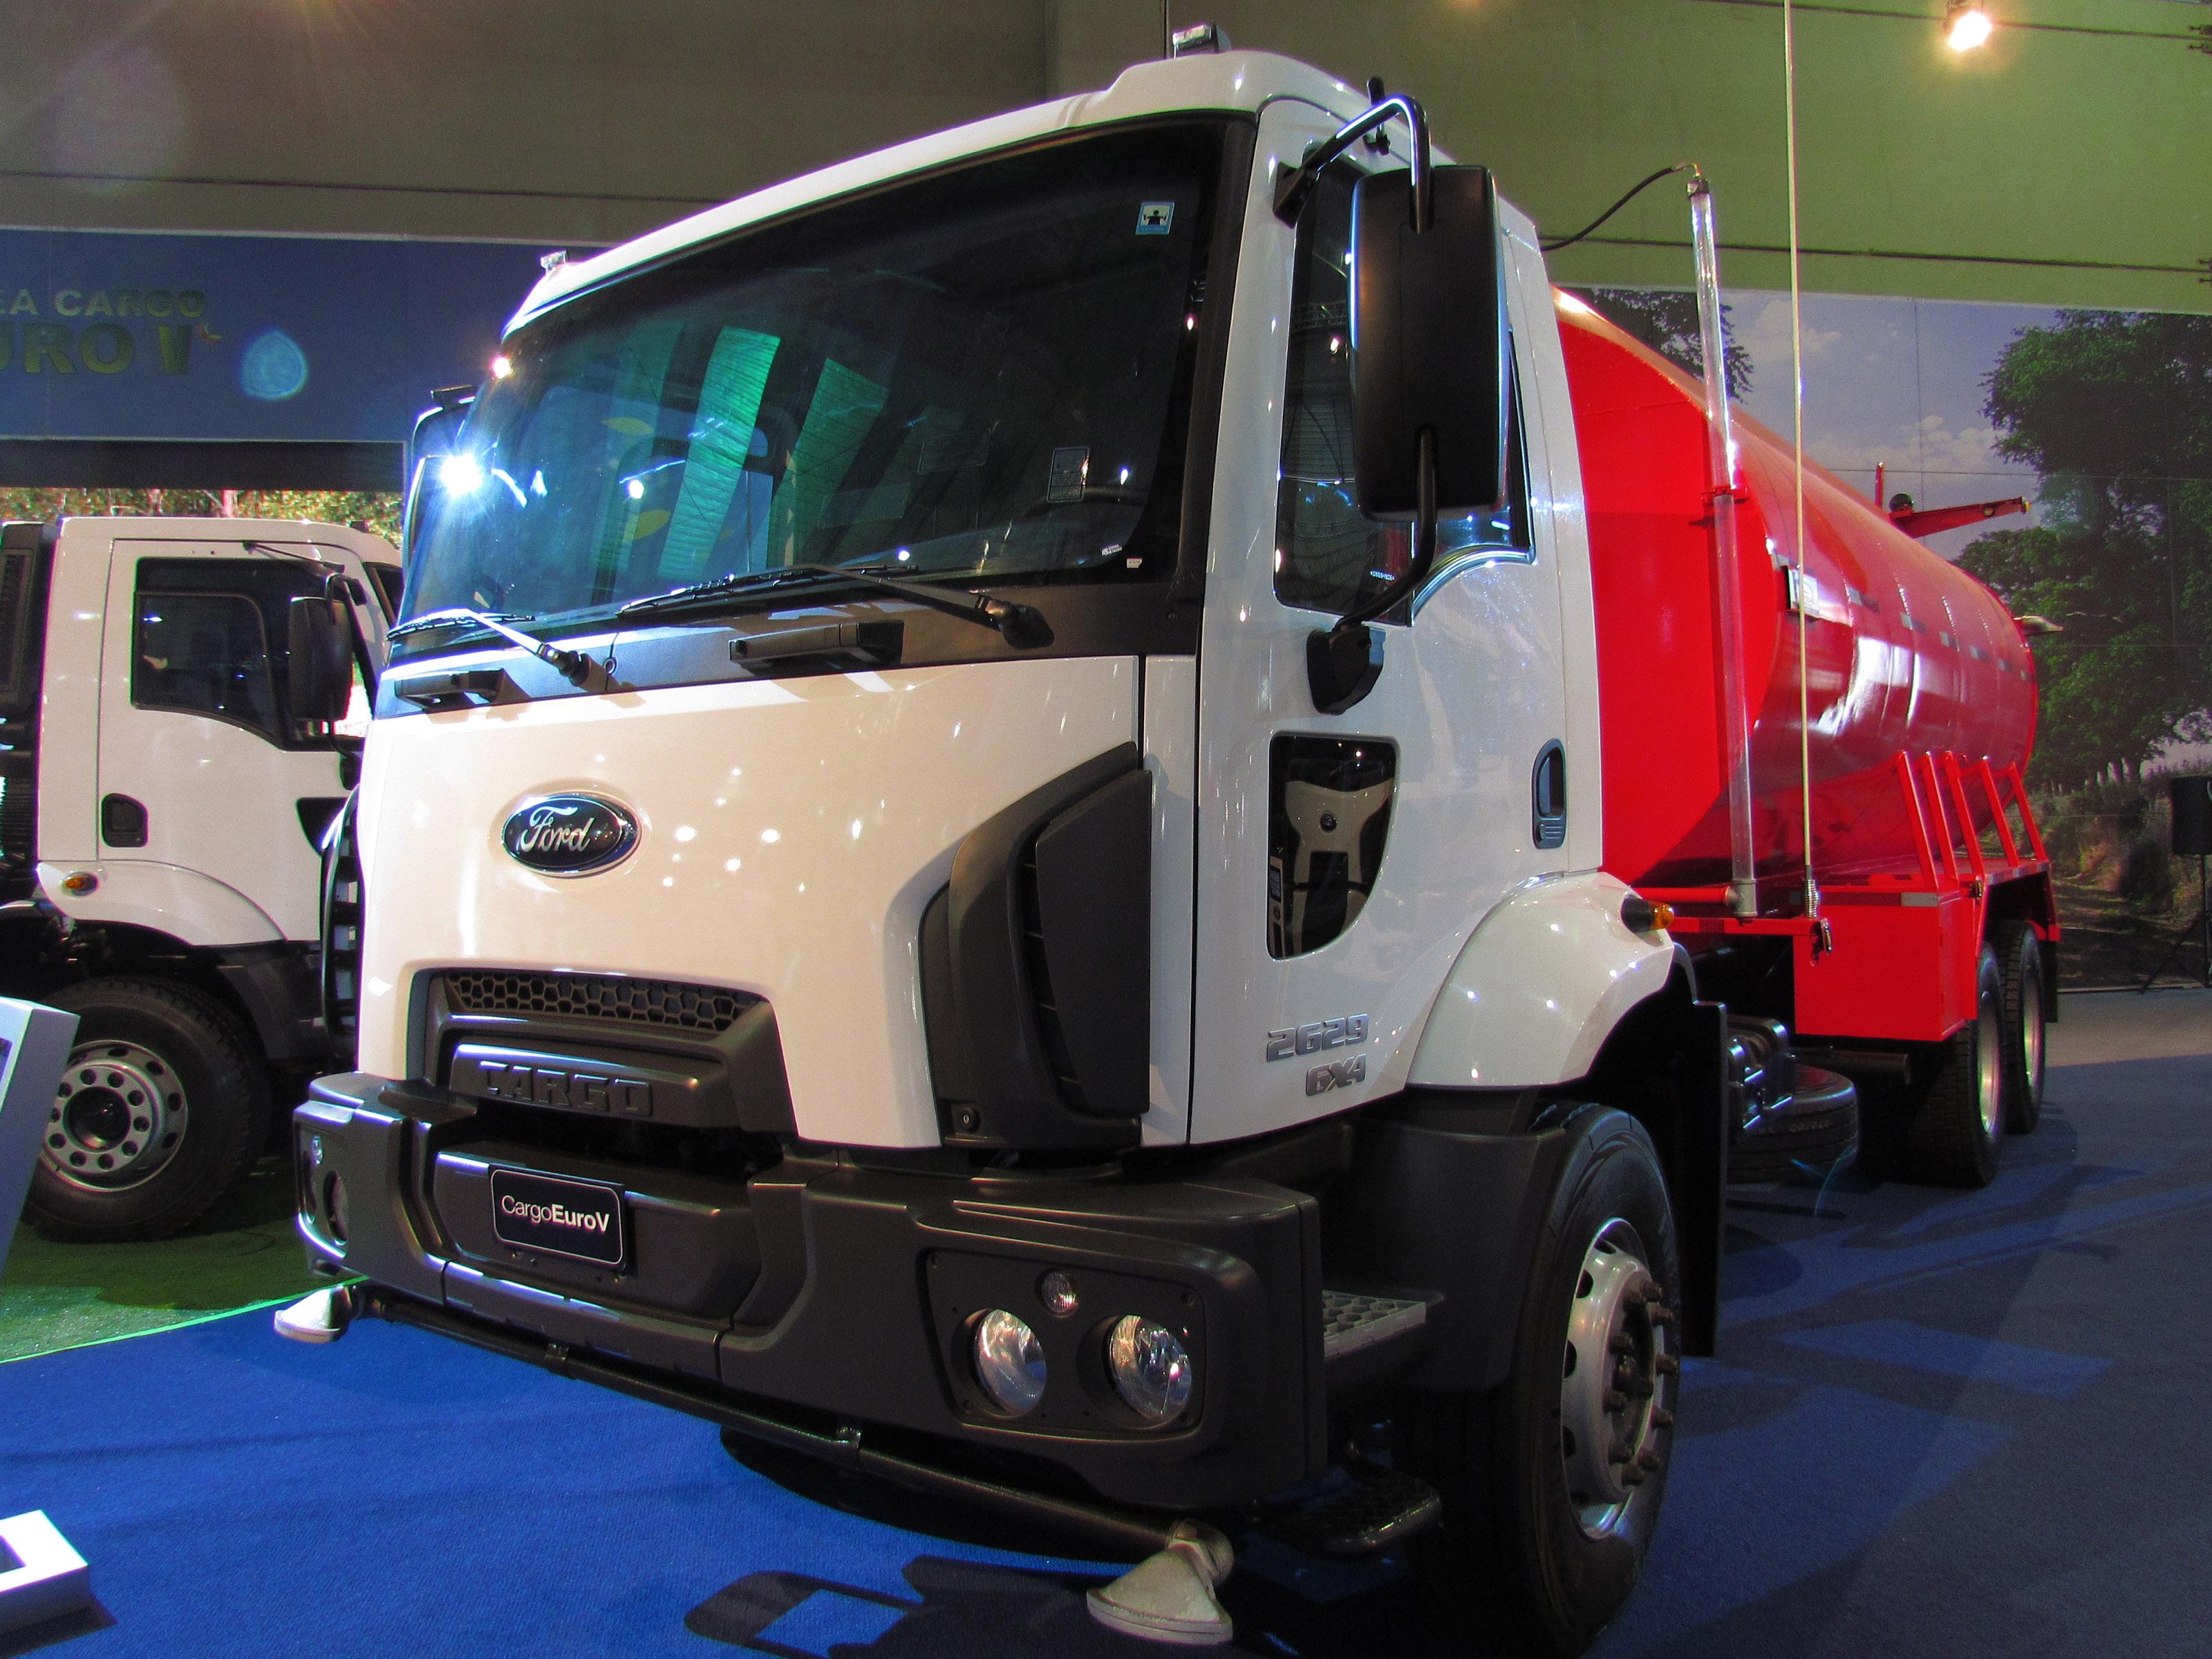 File:Ford Cargo 2629 6x4 2012 (13770846904).jpg